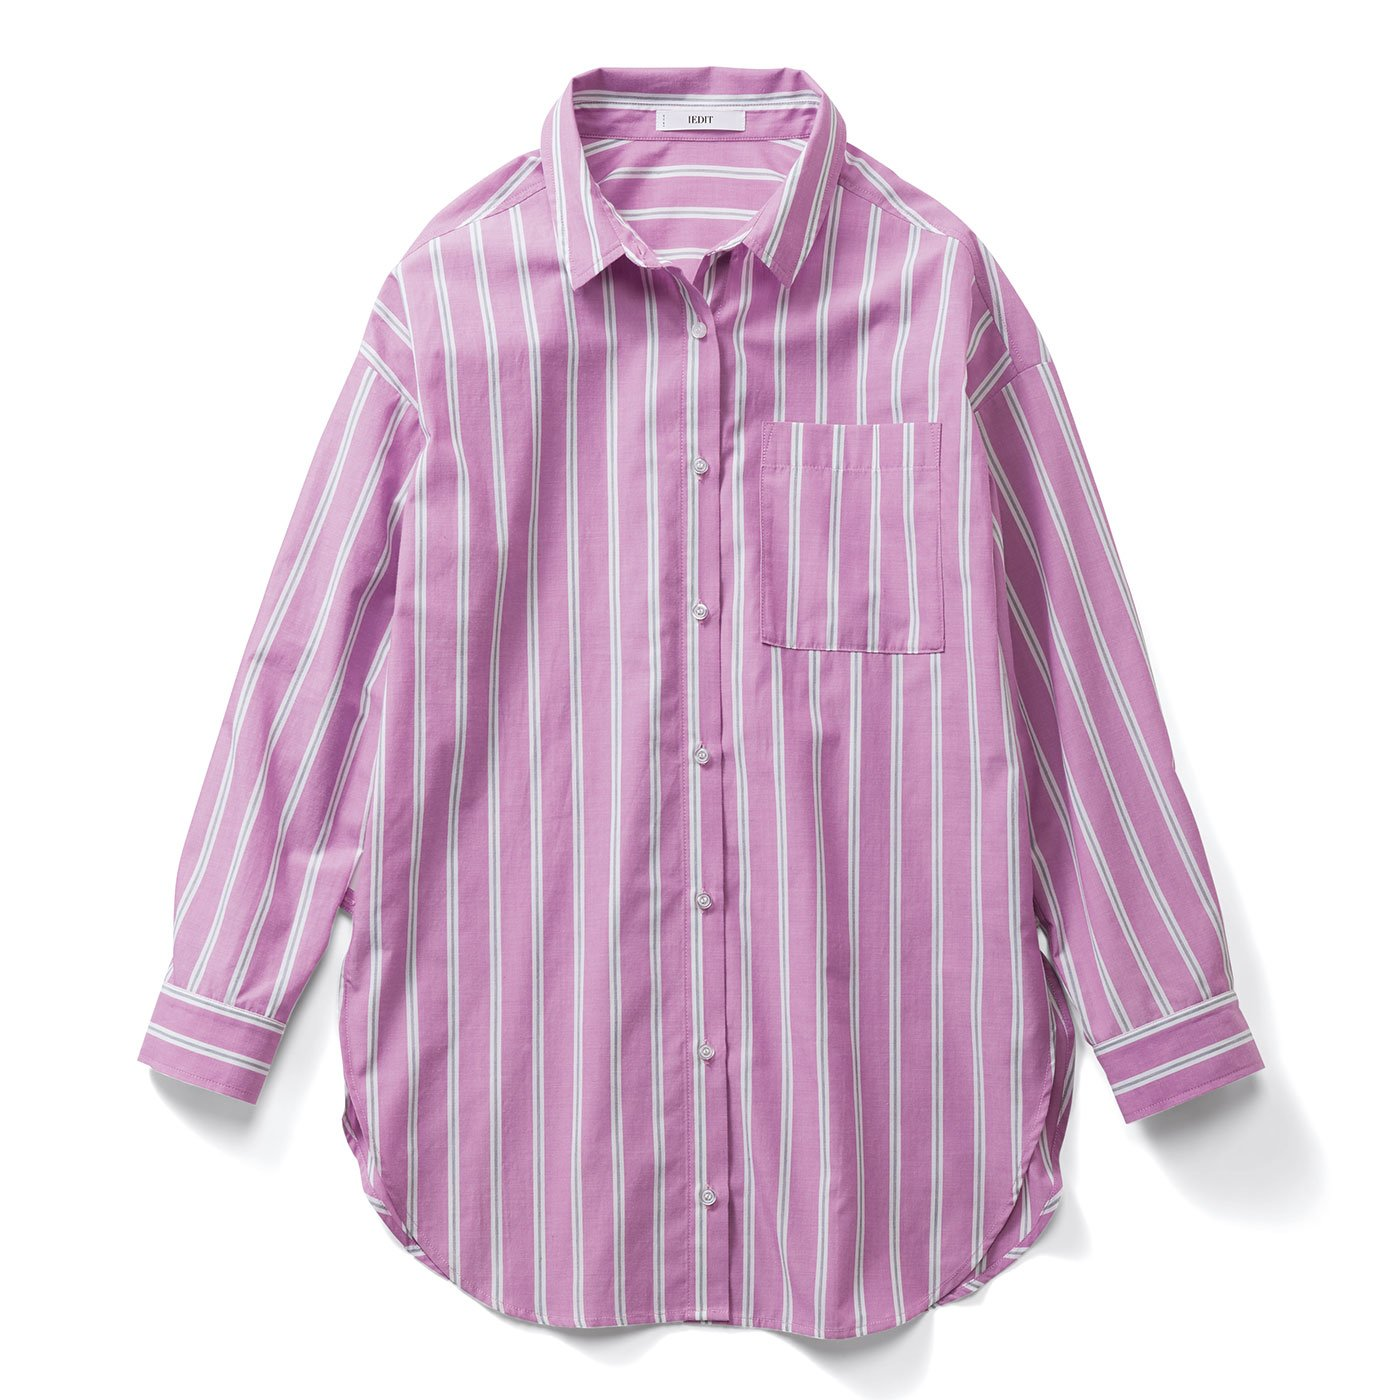 IEDIT[イディット] キレイ色で着映えする ソロテックス(R)混のストライプロングシャツ〈パープル〉